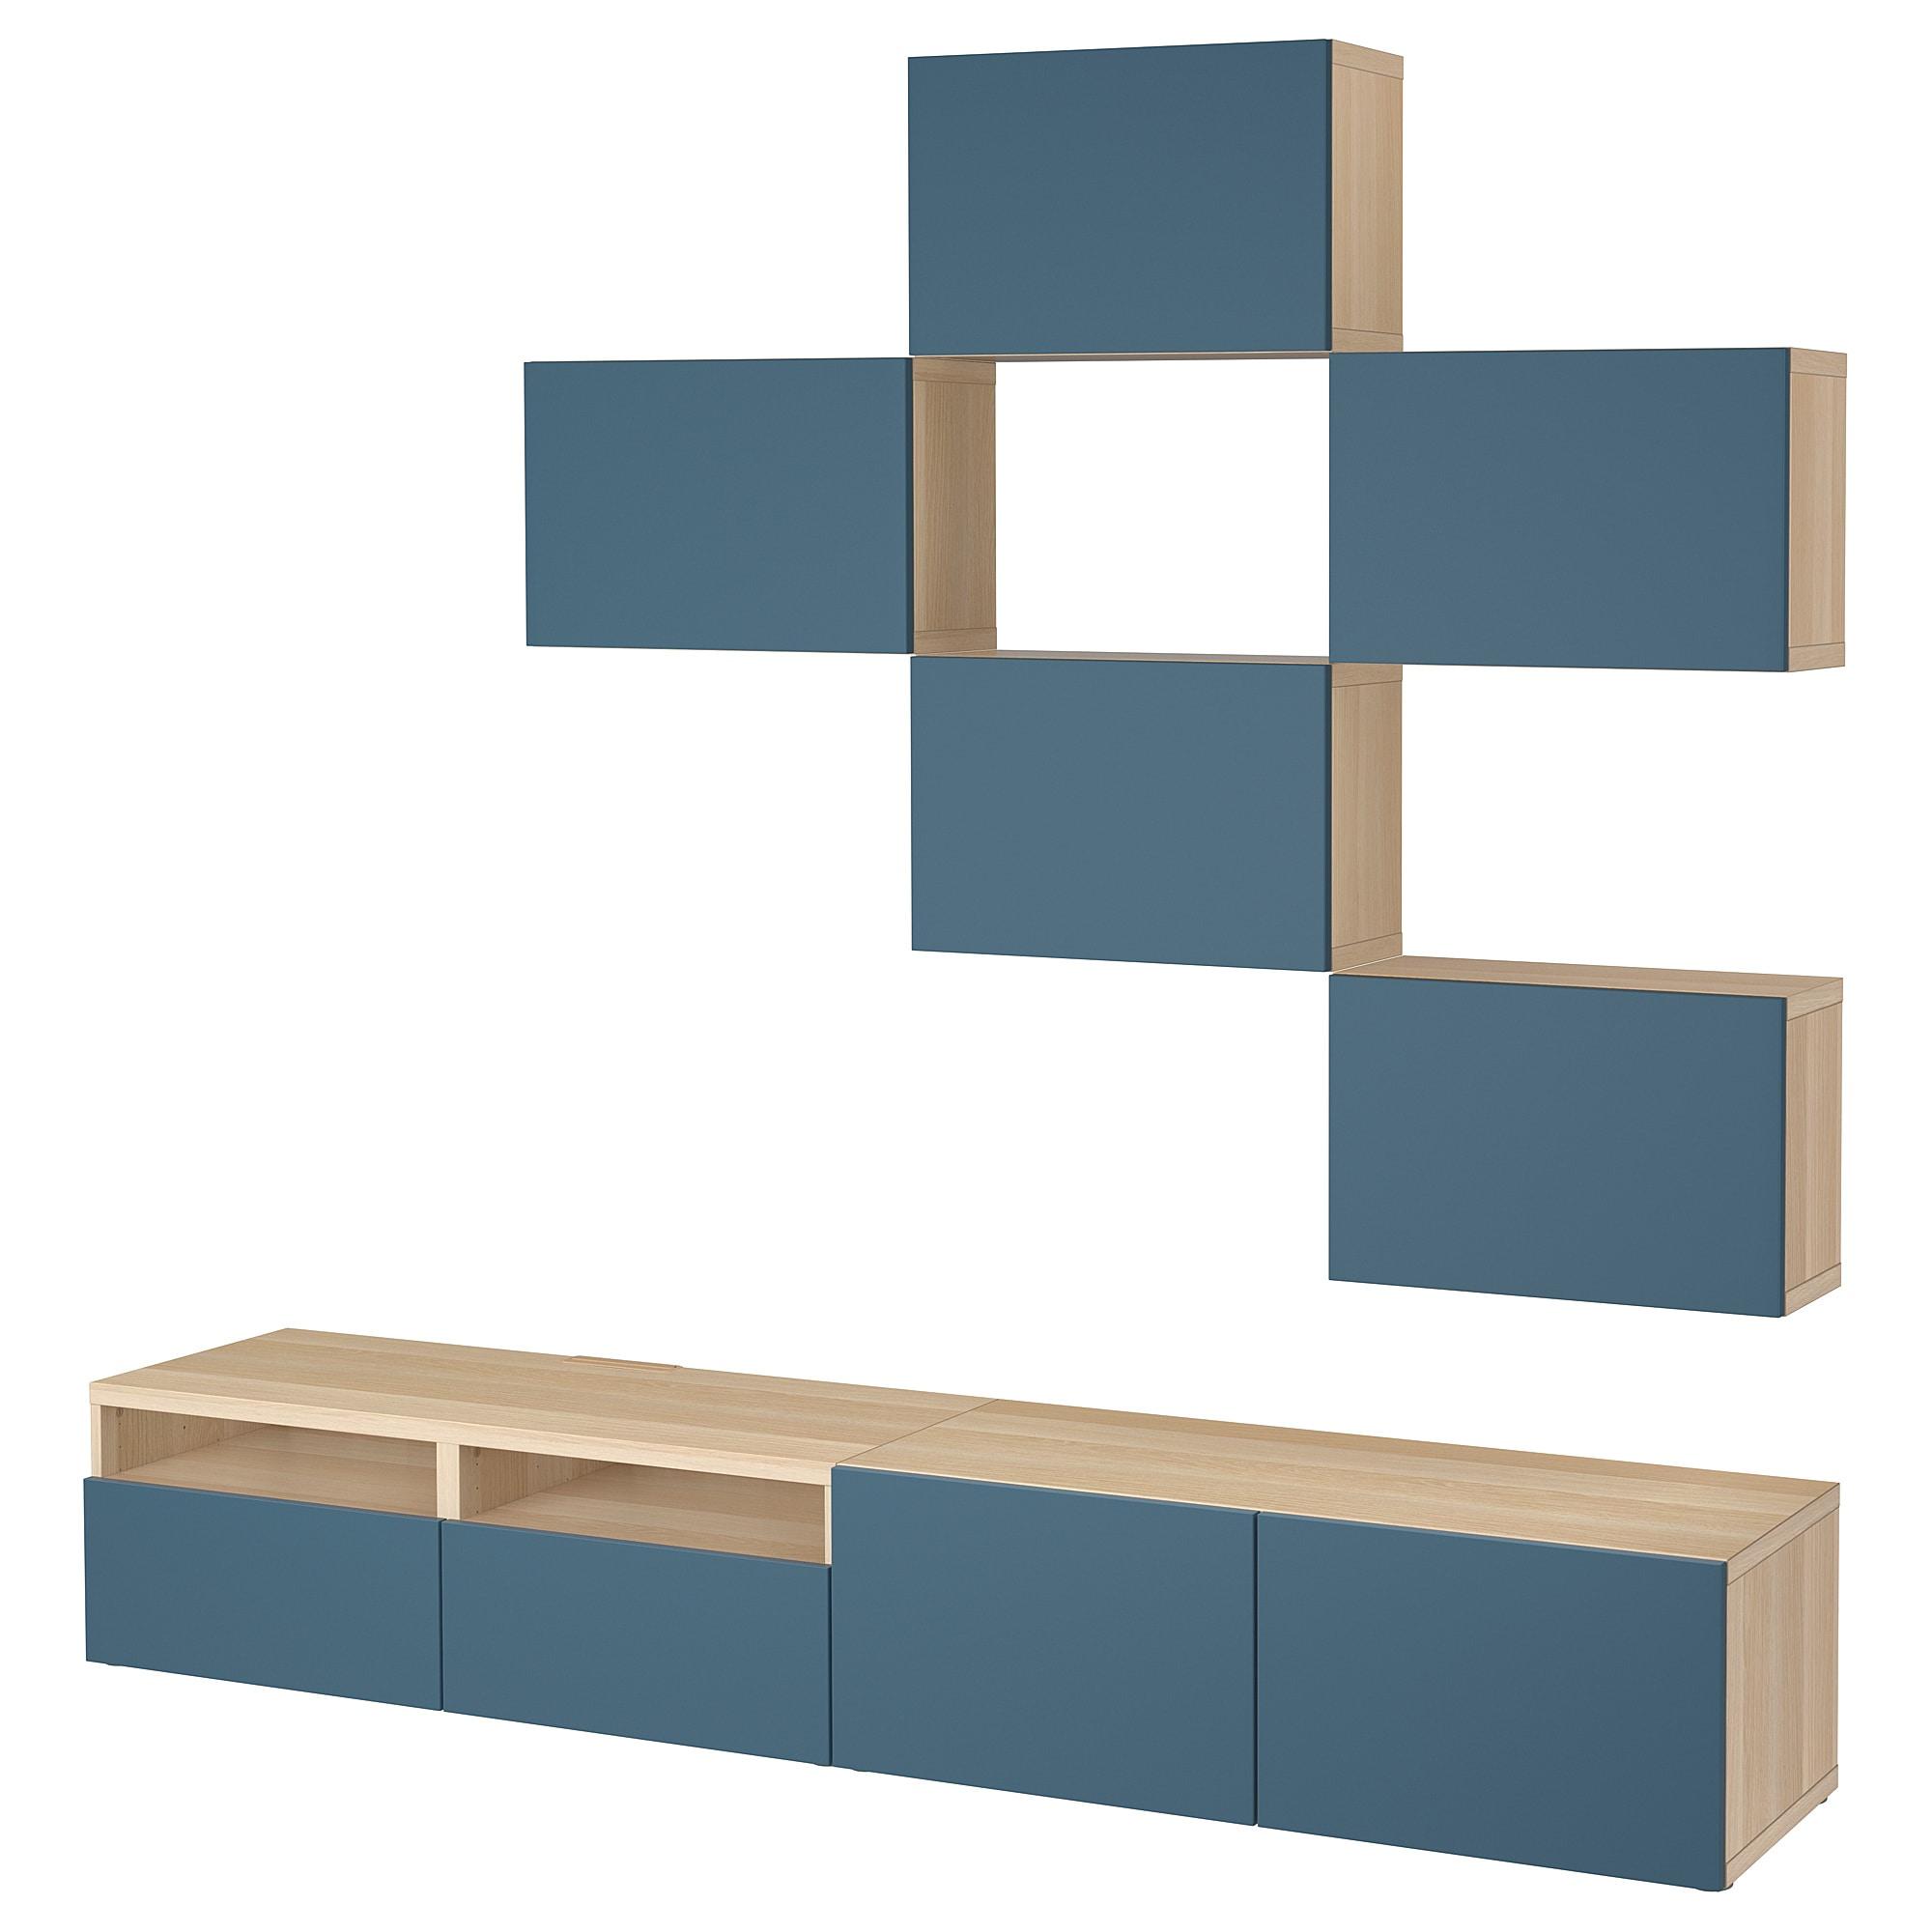 Шкаф для ТВ, комбинация БЕСТО темно-синий артикуль № 592.516.66 в наличии. Онлайн магазин ИКЕА РБ. Быстрая доставка и соборка.